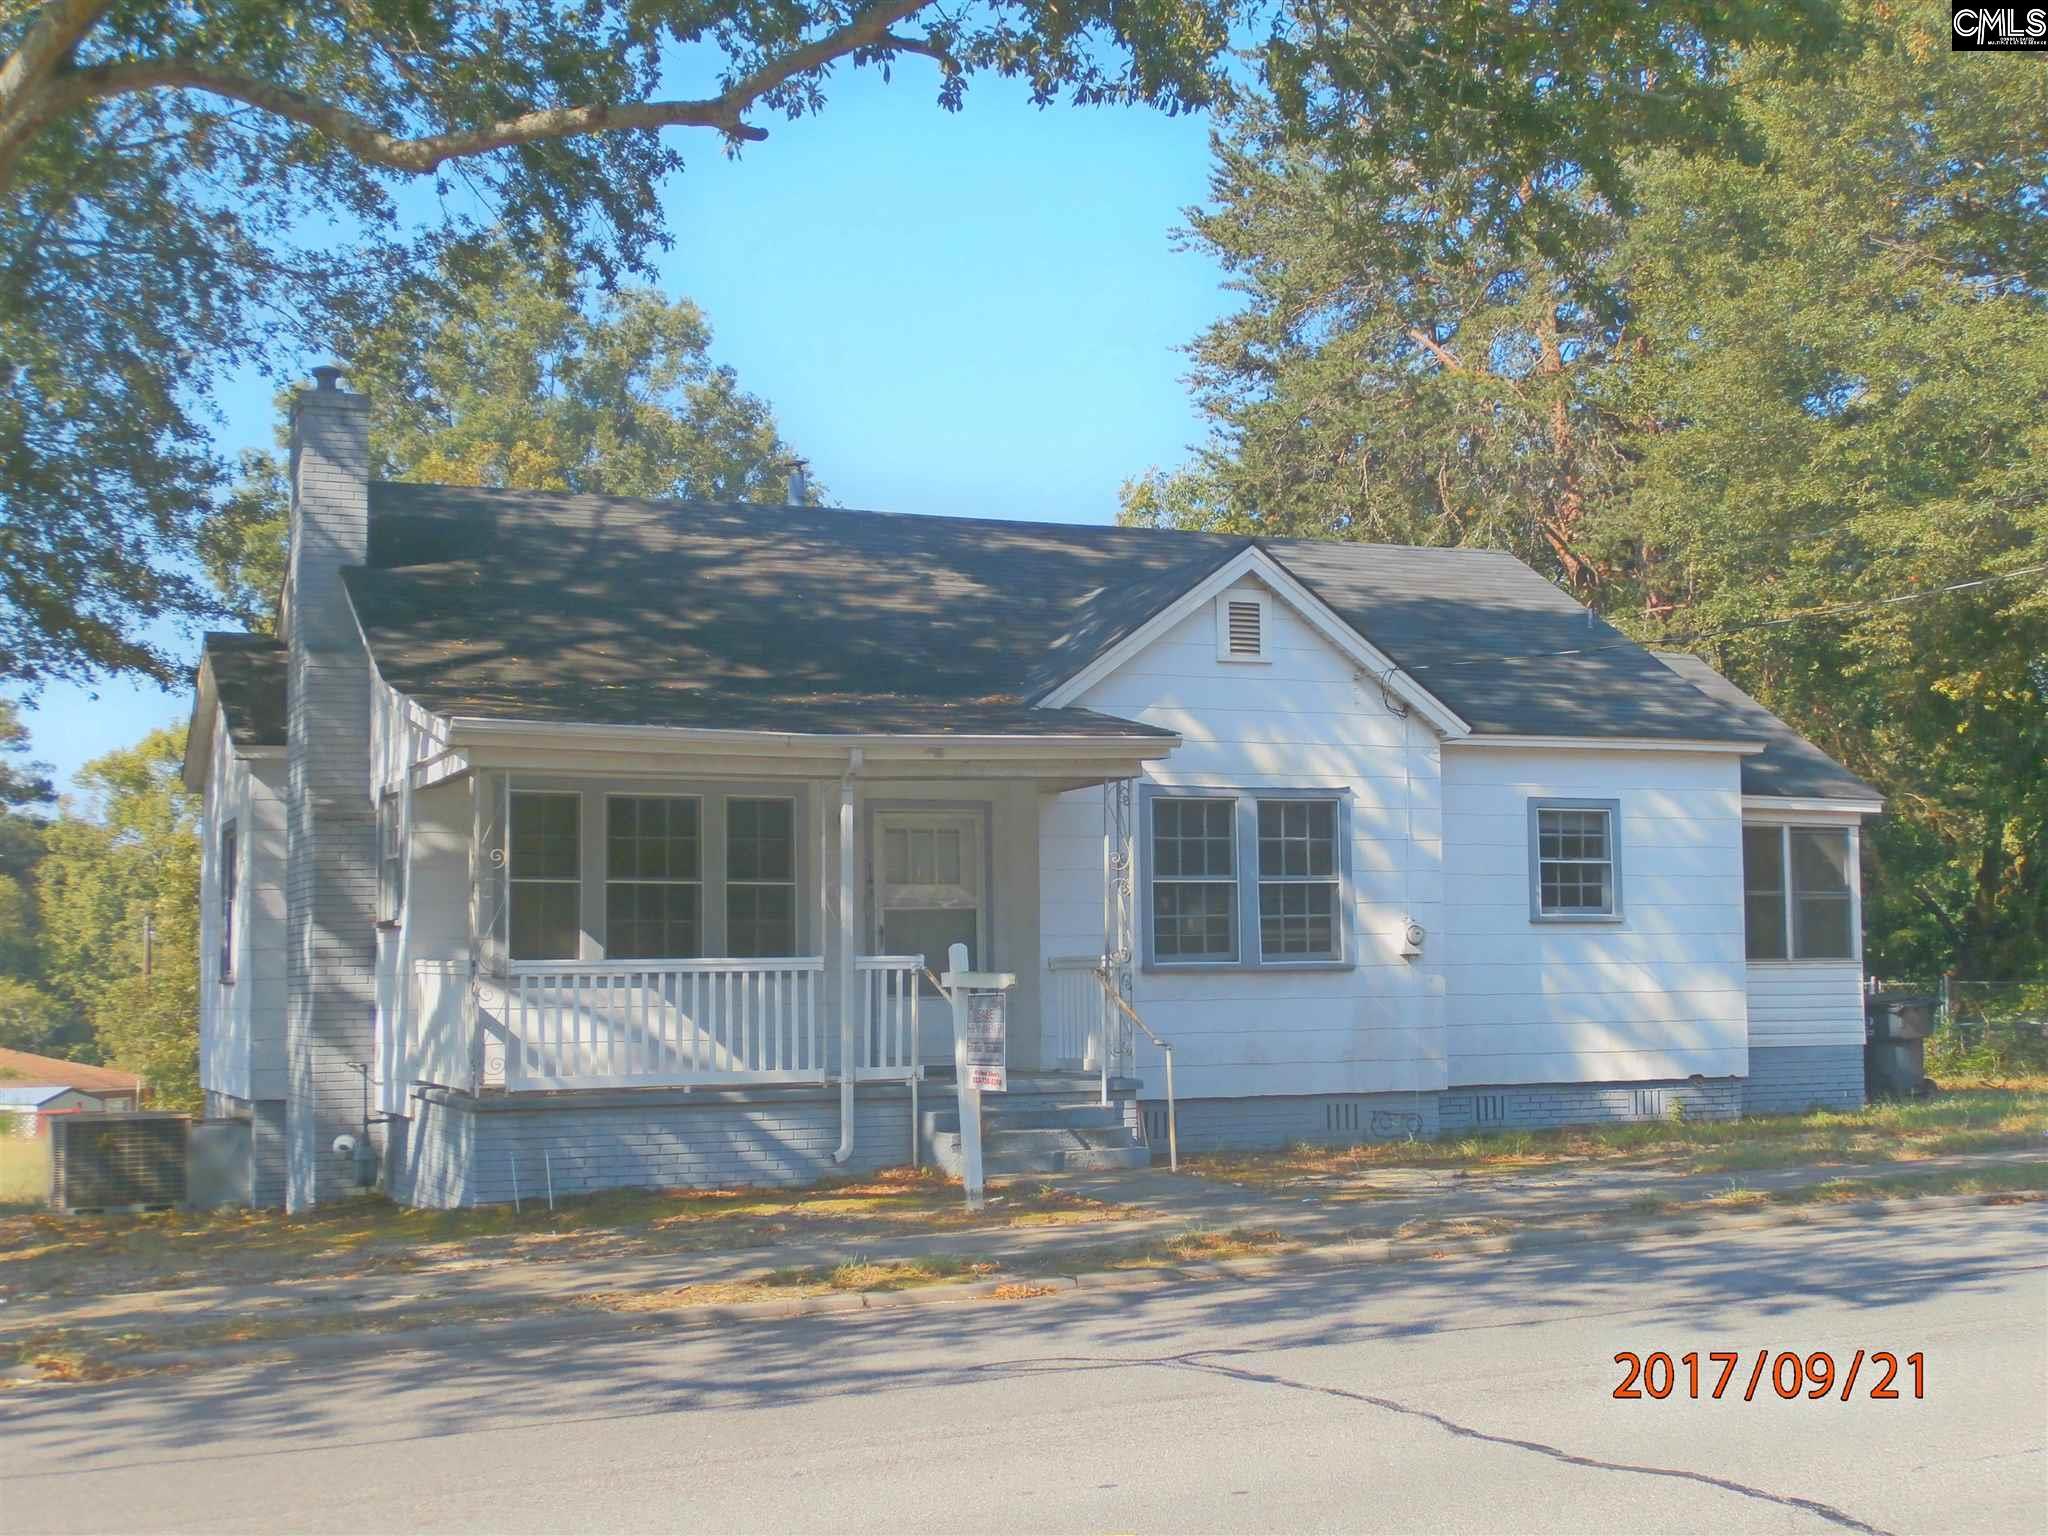 143 S Pine Batesburg, SC 29006